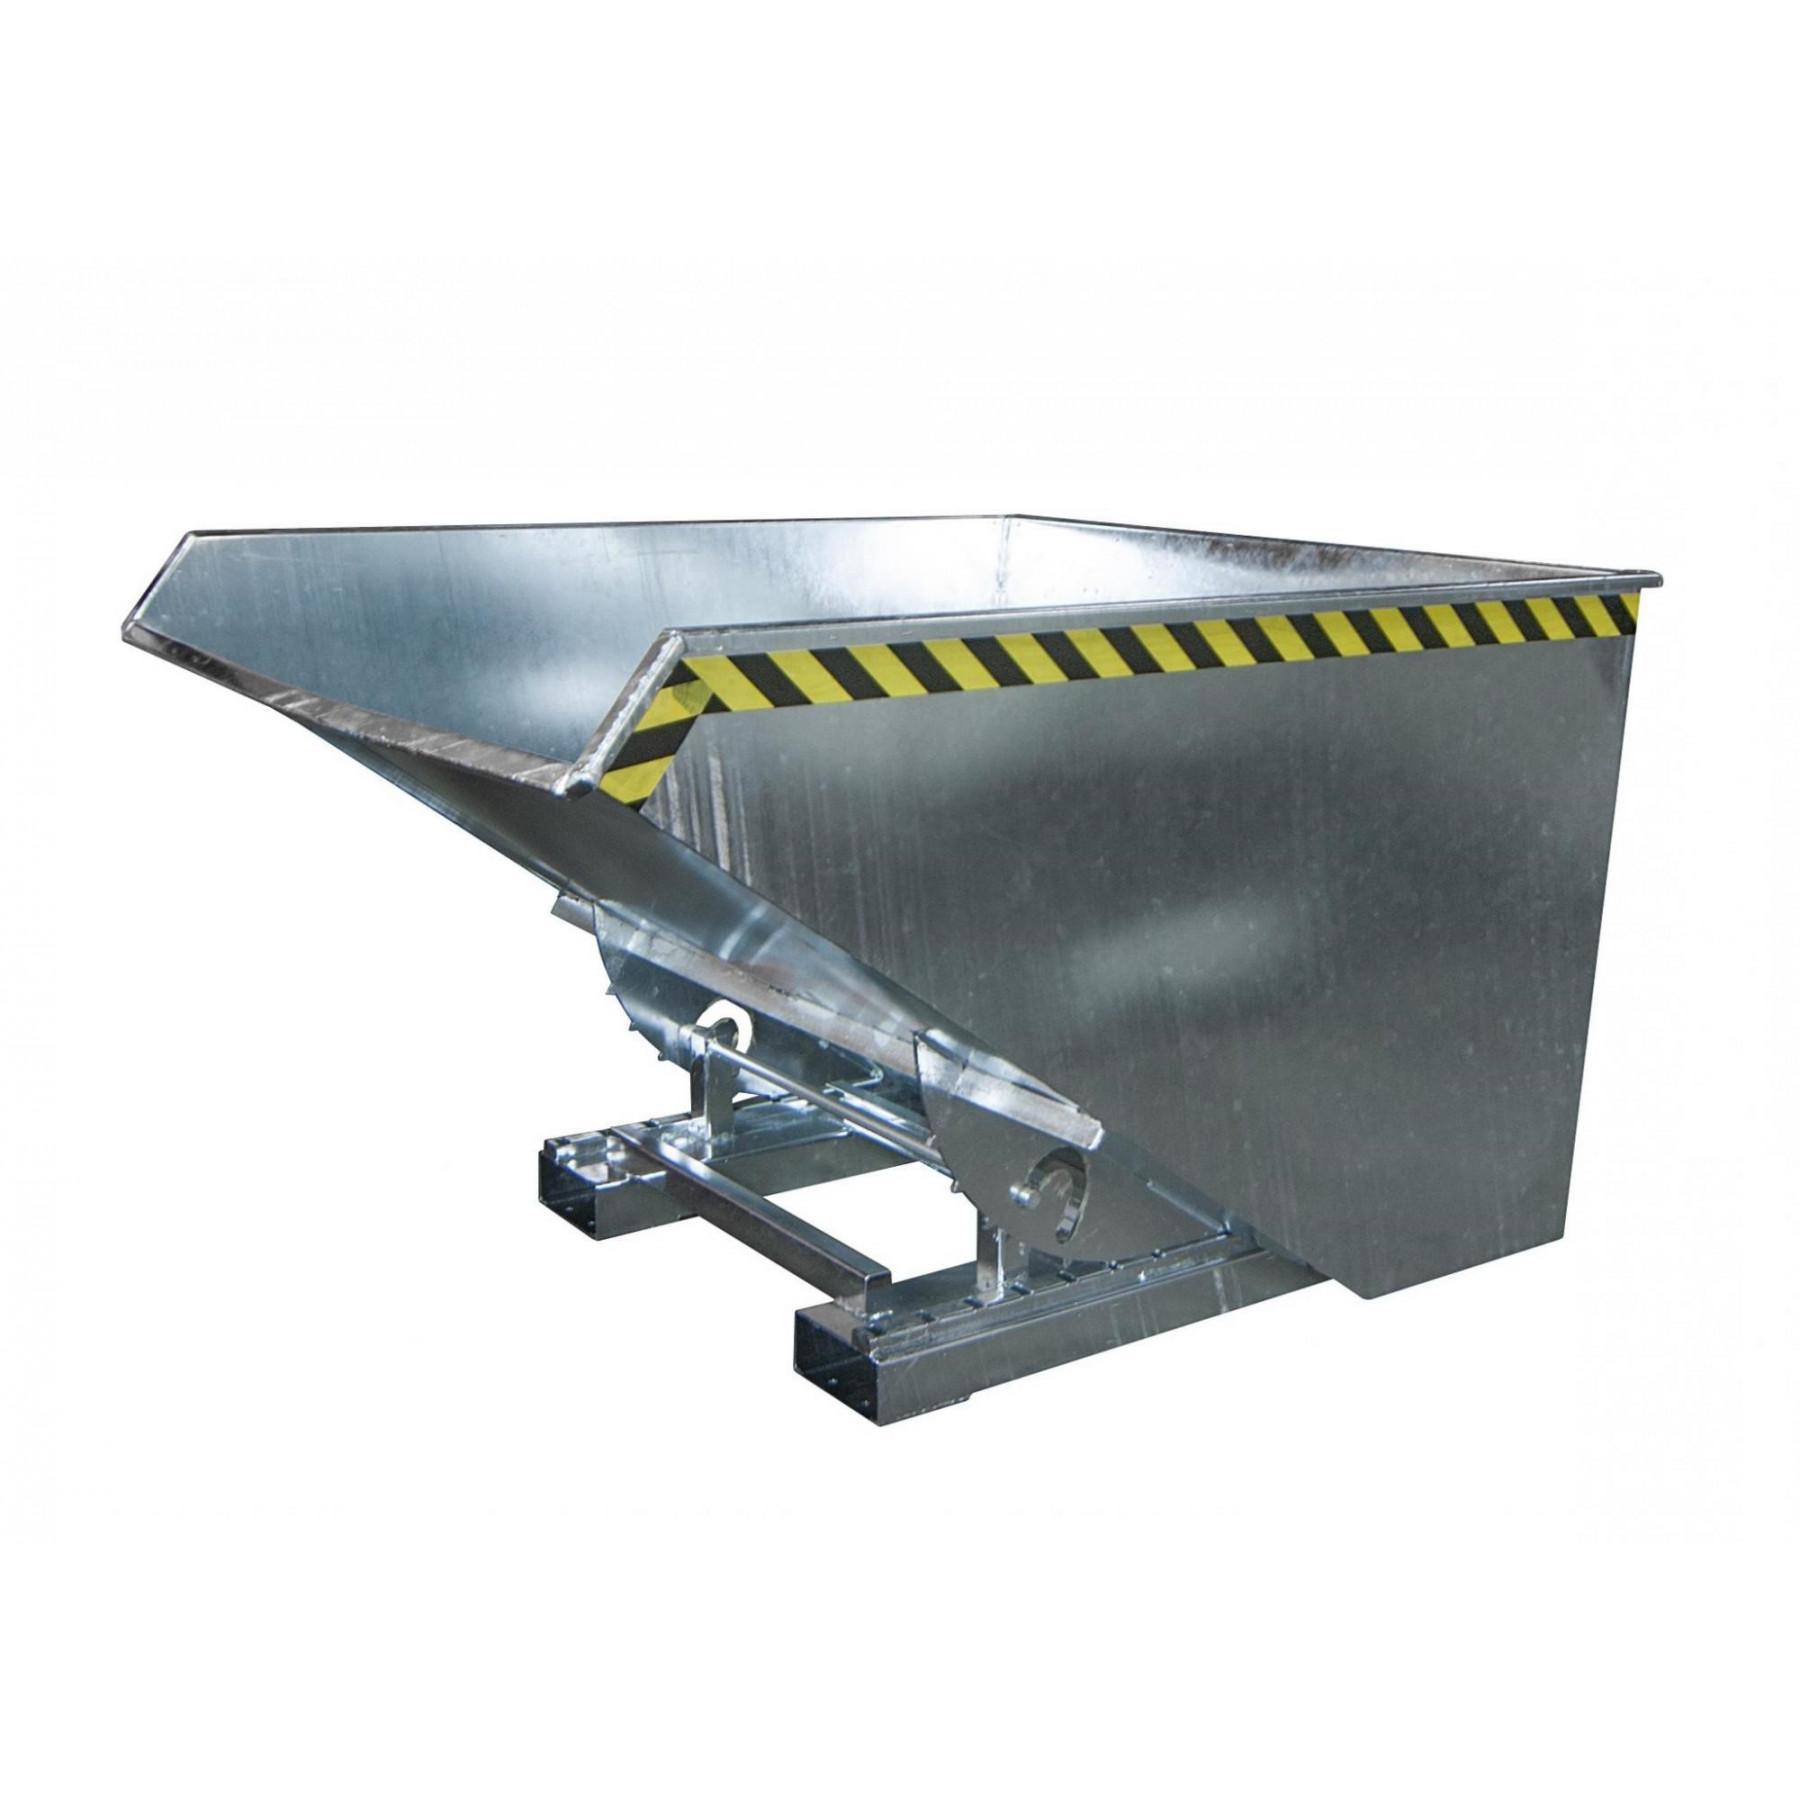 Kiepcontainer 1700 liter, hoog model, MTF-1700-V